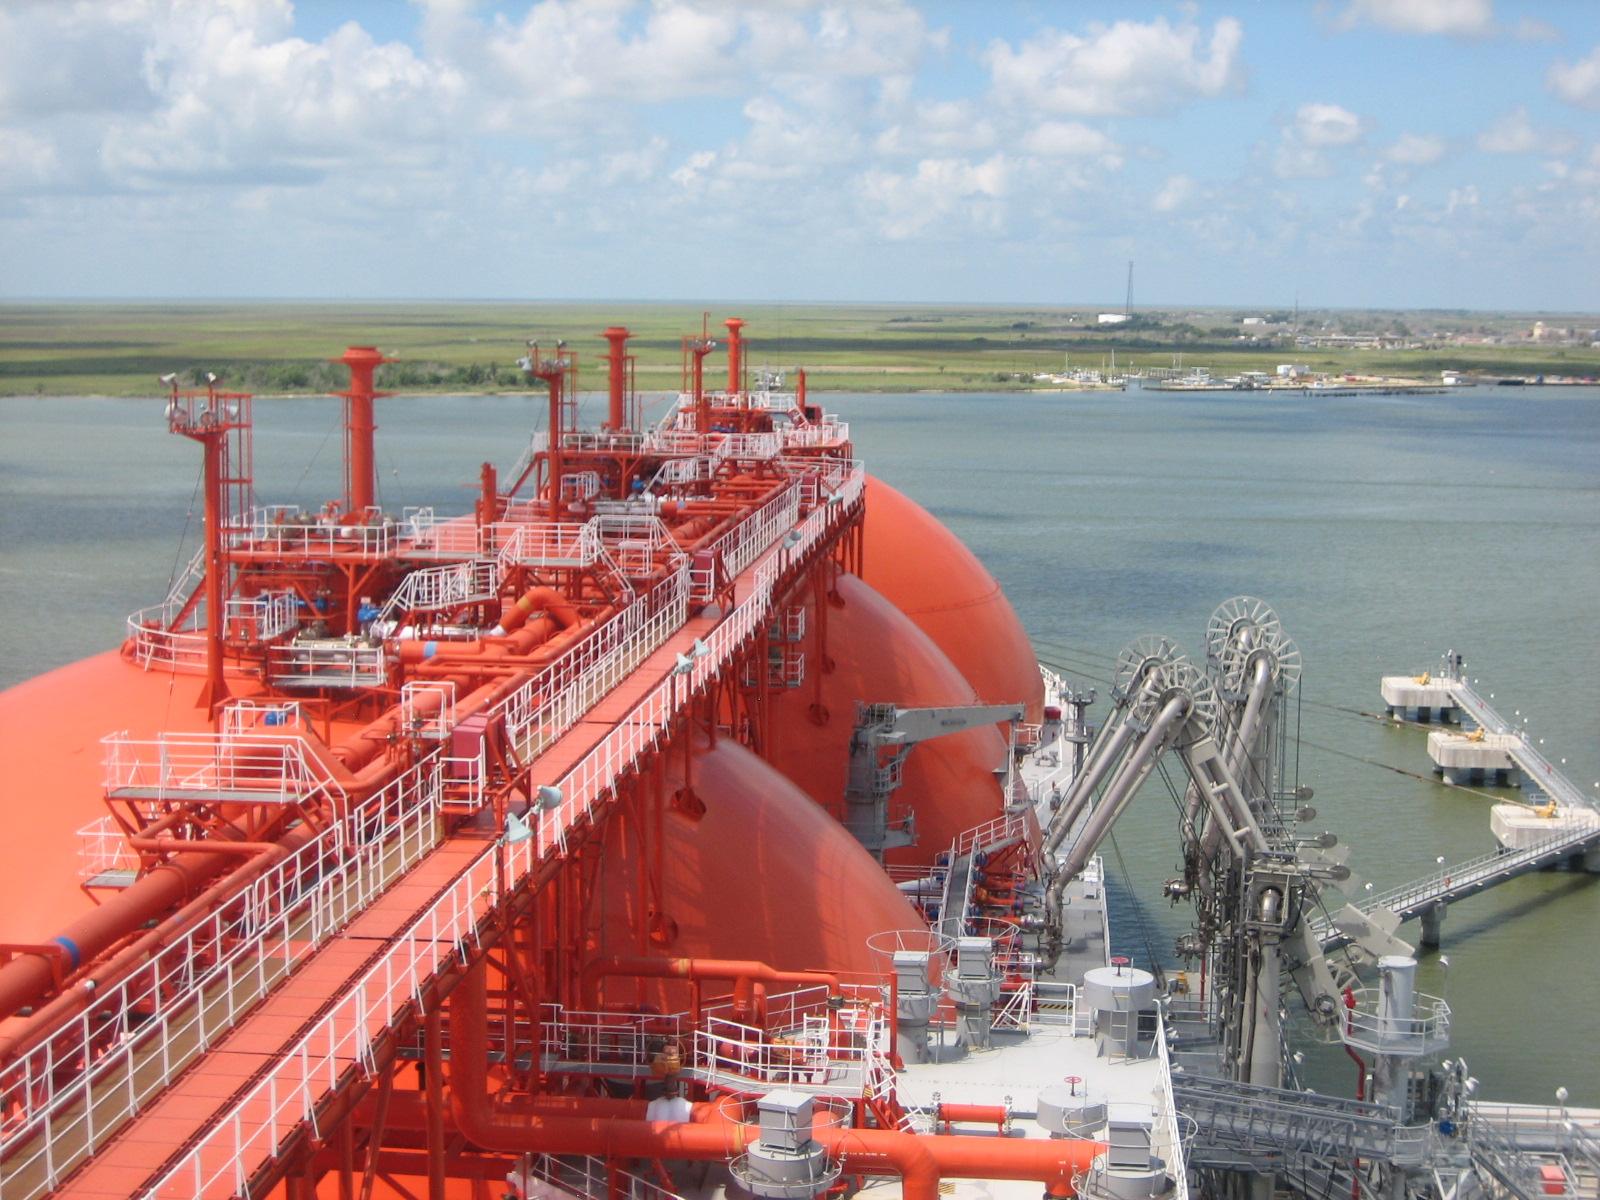 Energy Deal Solutions LLC, LNG ship Neva River loading at Sabine Pass LNG, IMG_2858IMG_2882